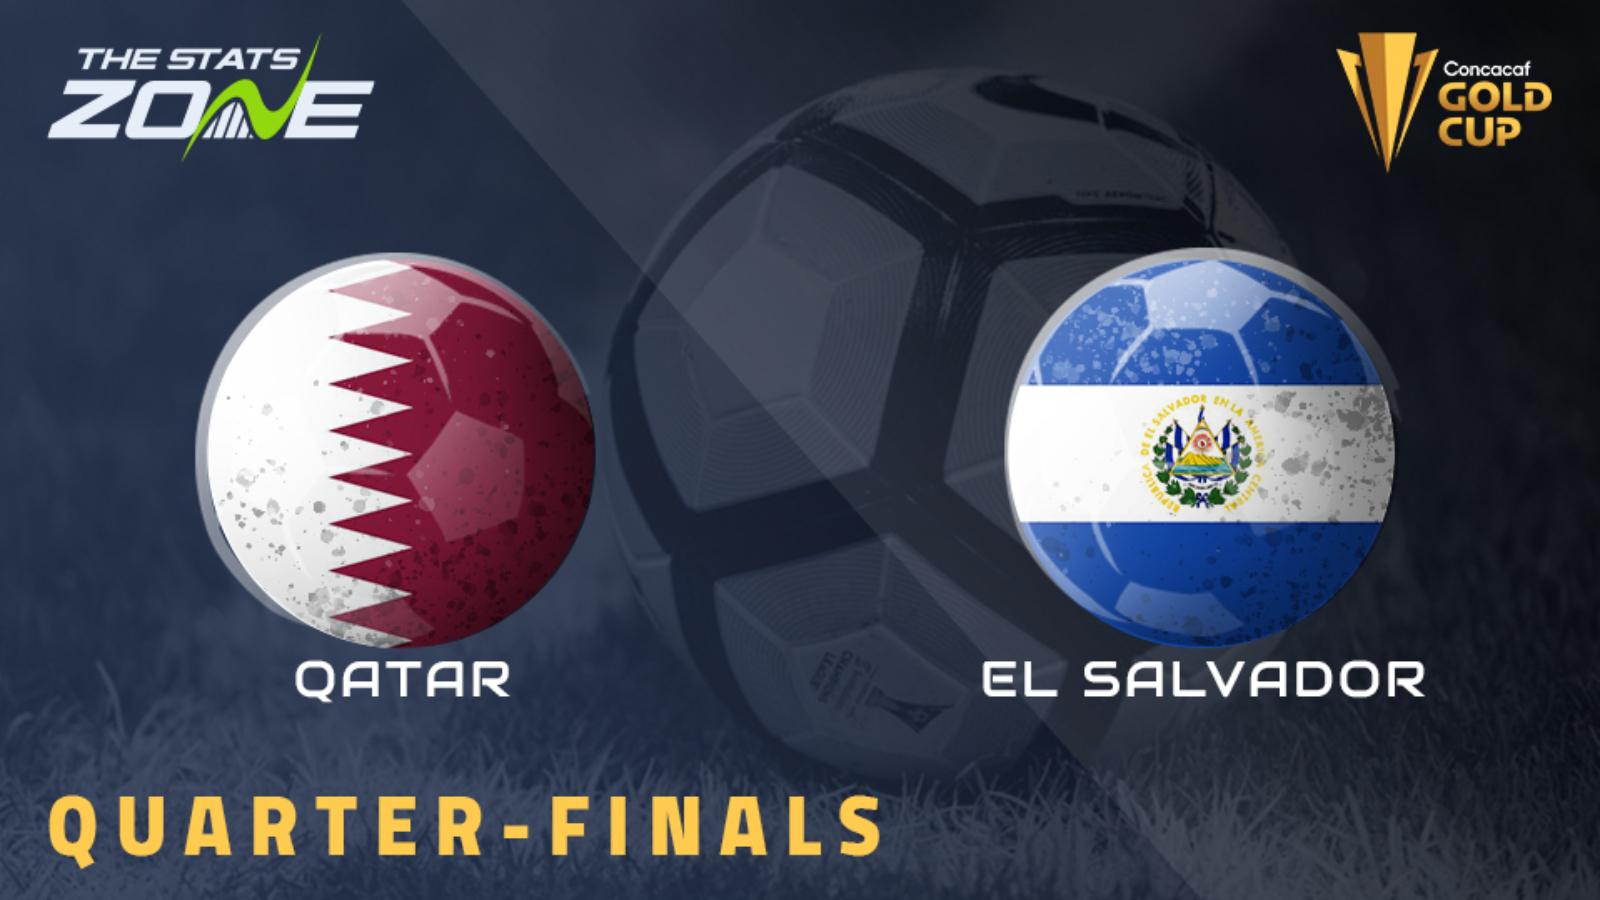 2021 Concacaf Gold Cup Qatar Vs El Salvador Preview Prediction The Stats Zone